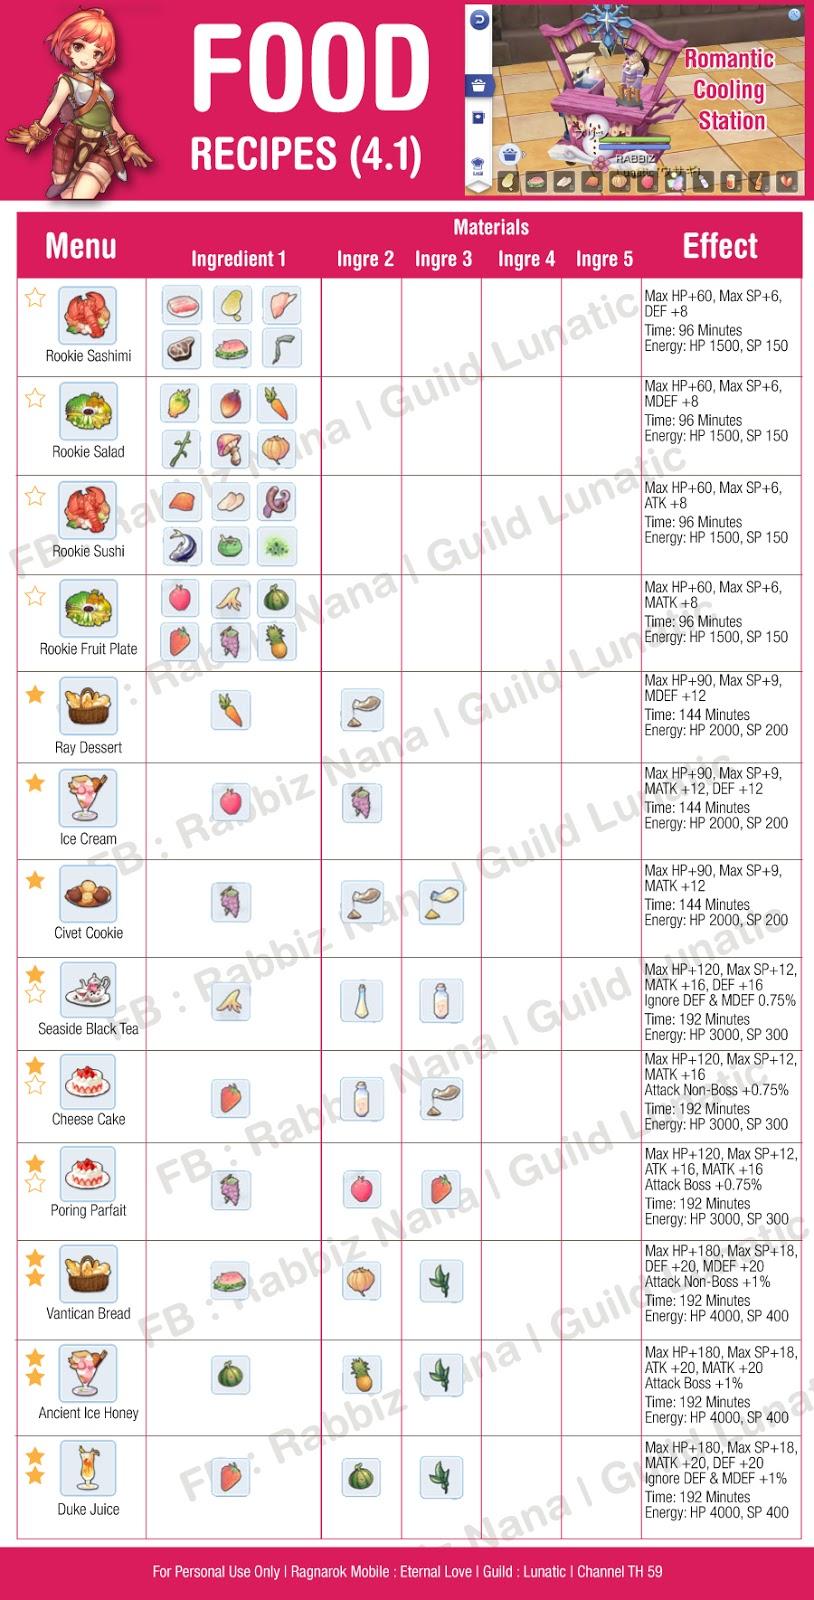 ZOENTY ONLINE ::: Ragnarok Mobile - Daftar Resep Masakan